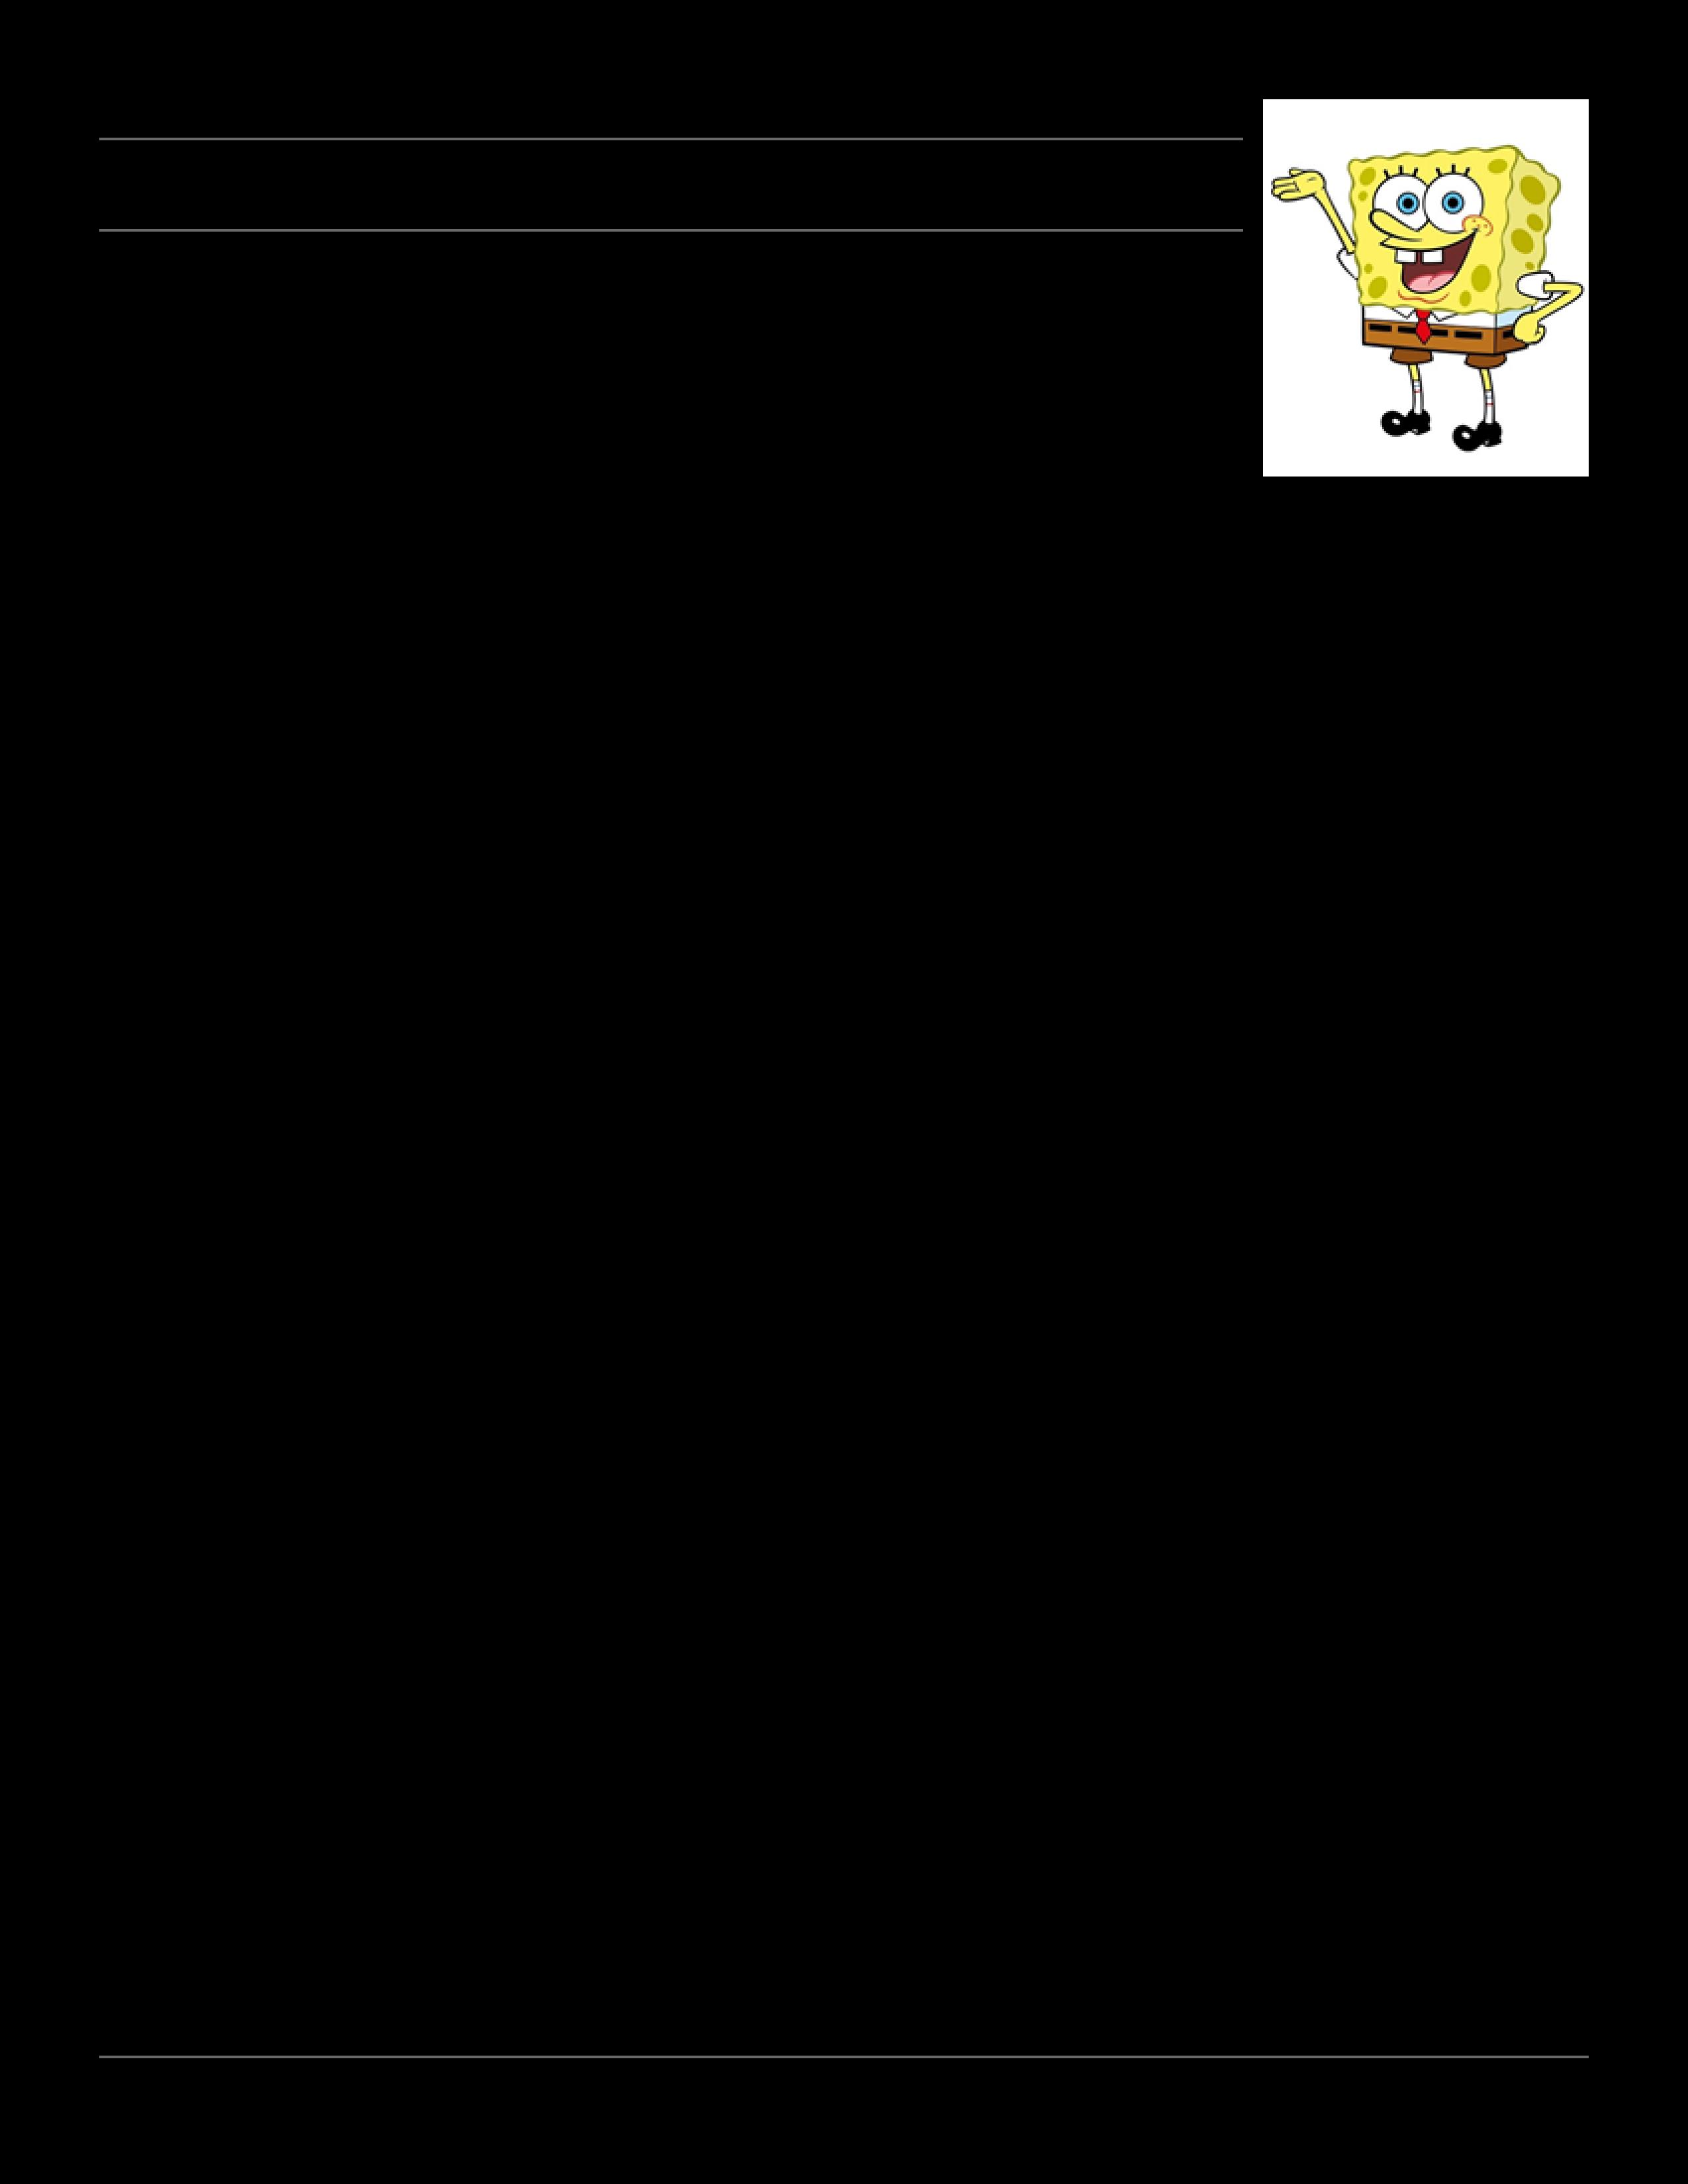 Free Spongebob Squarepants Word Search Templates At